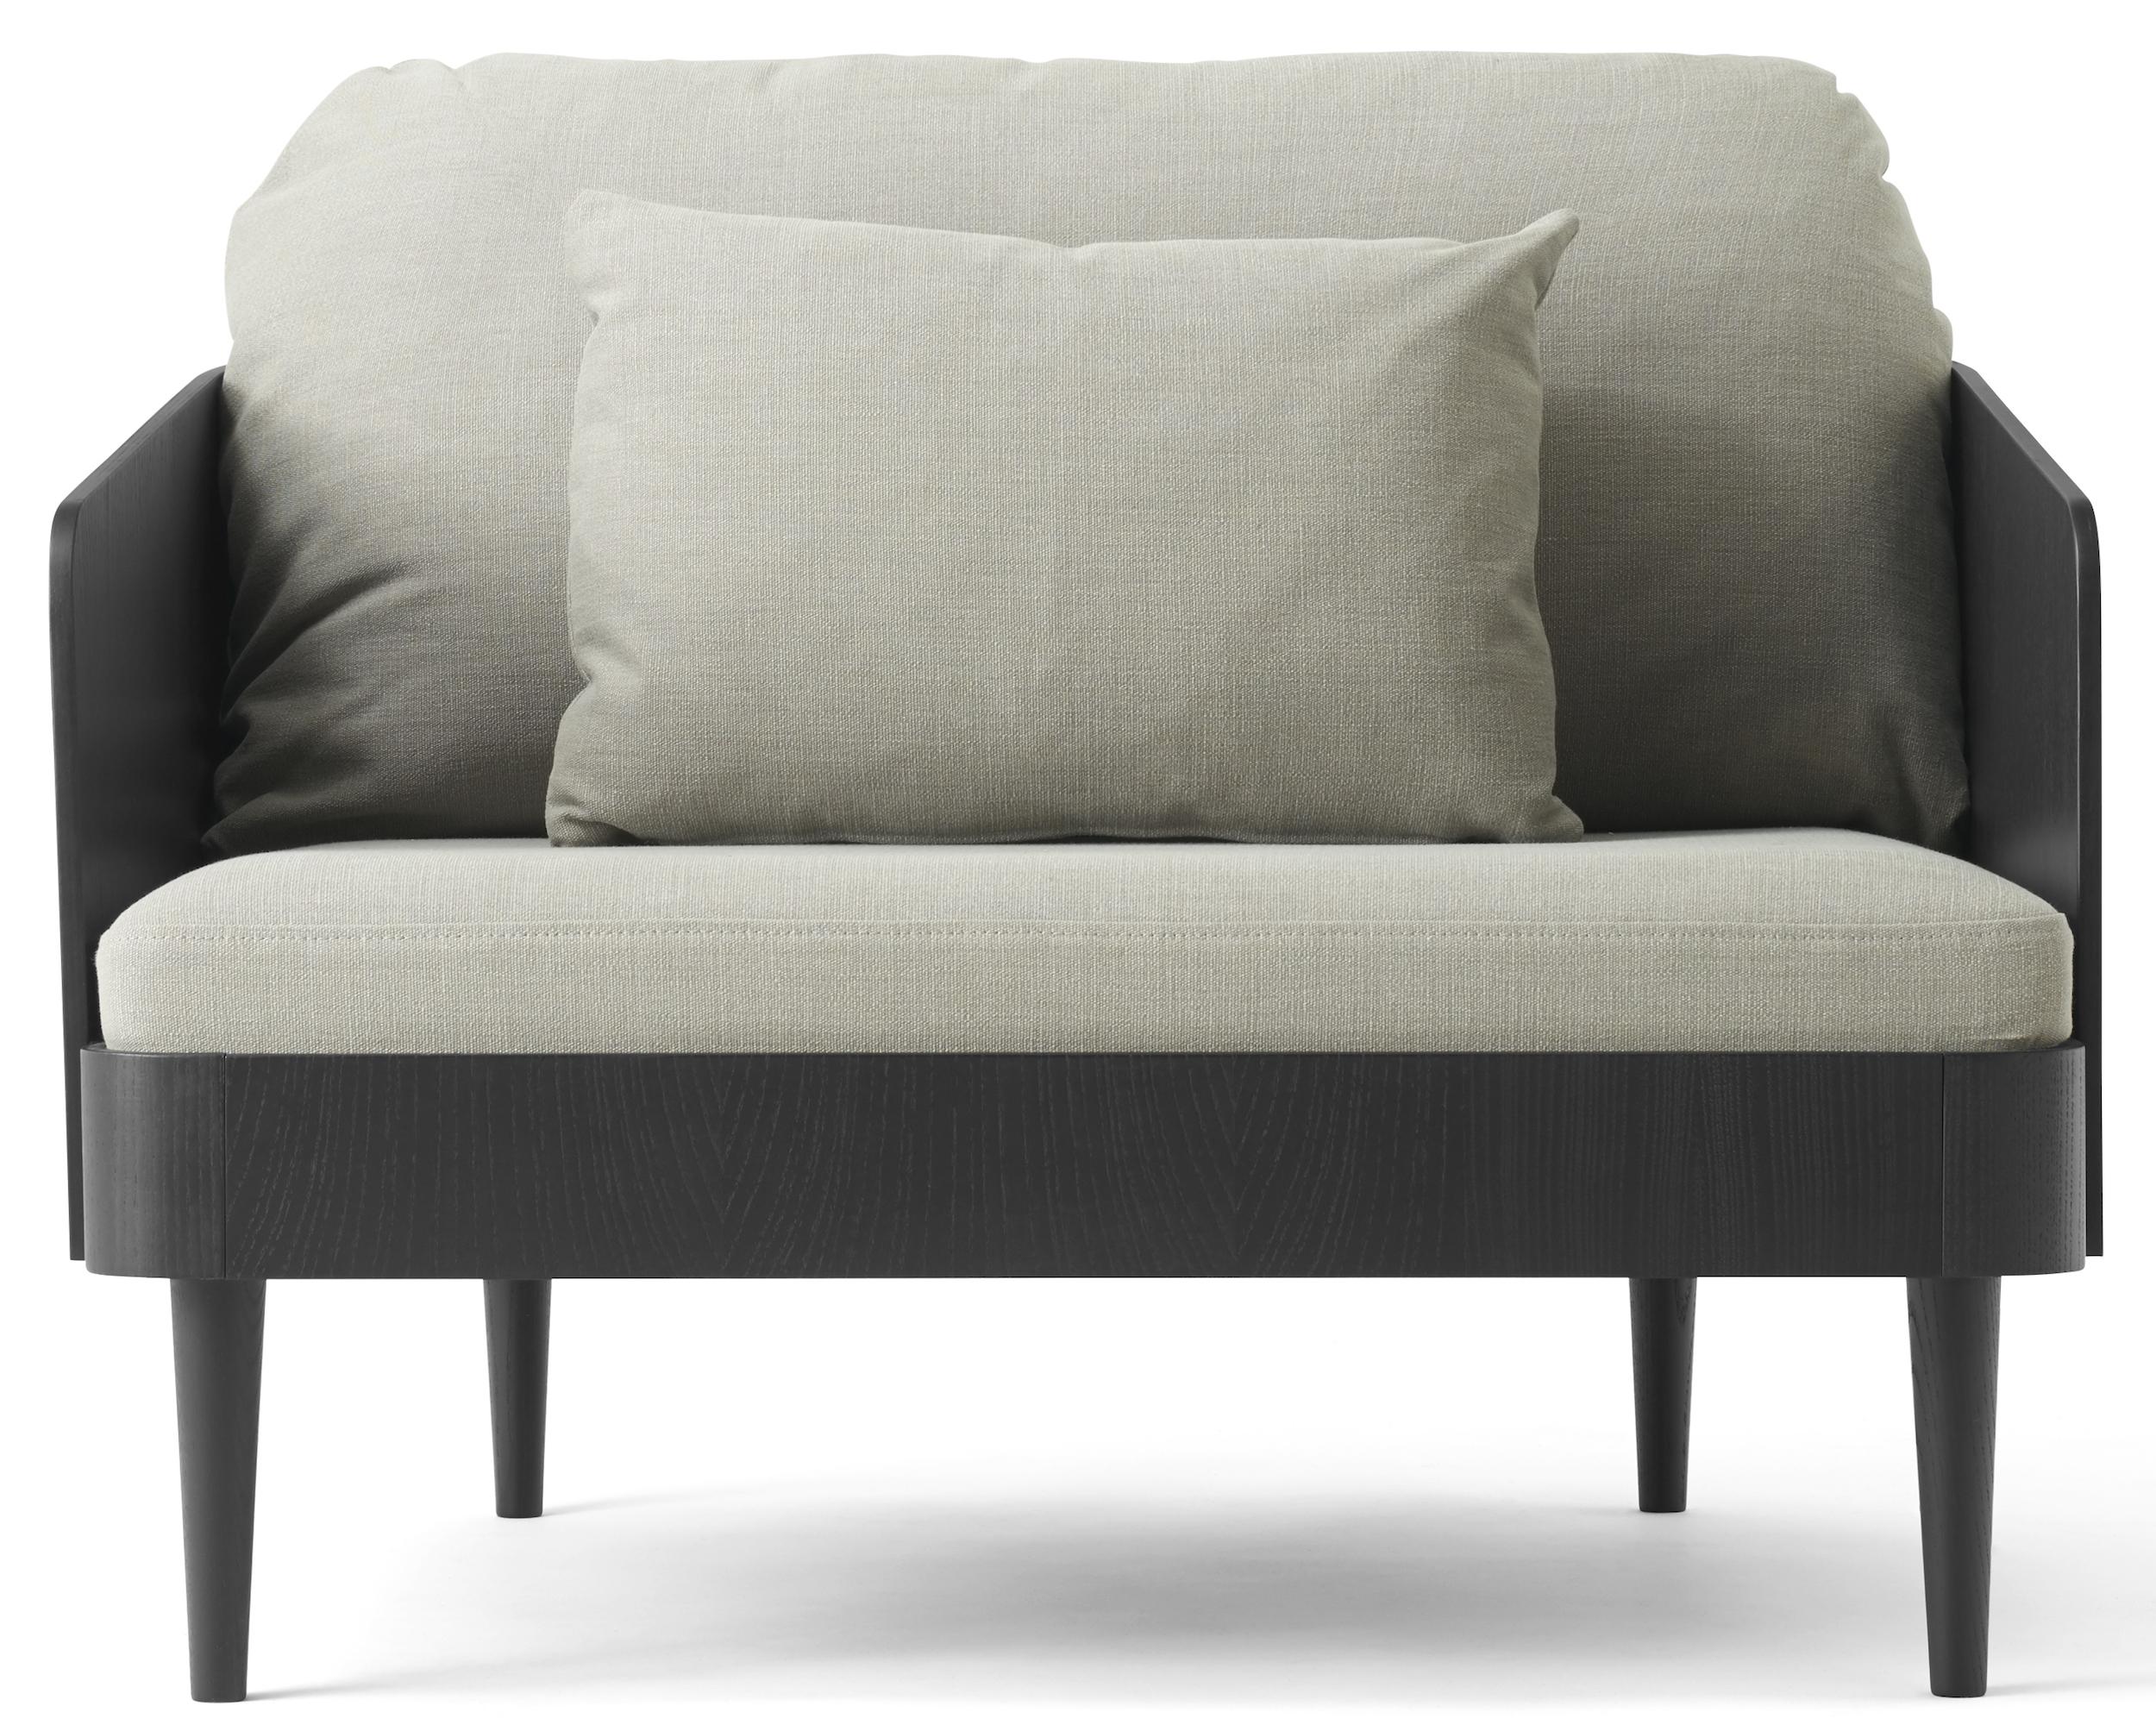 Menu Septembre Armchair And Sofa Design Theresa Rand